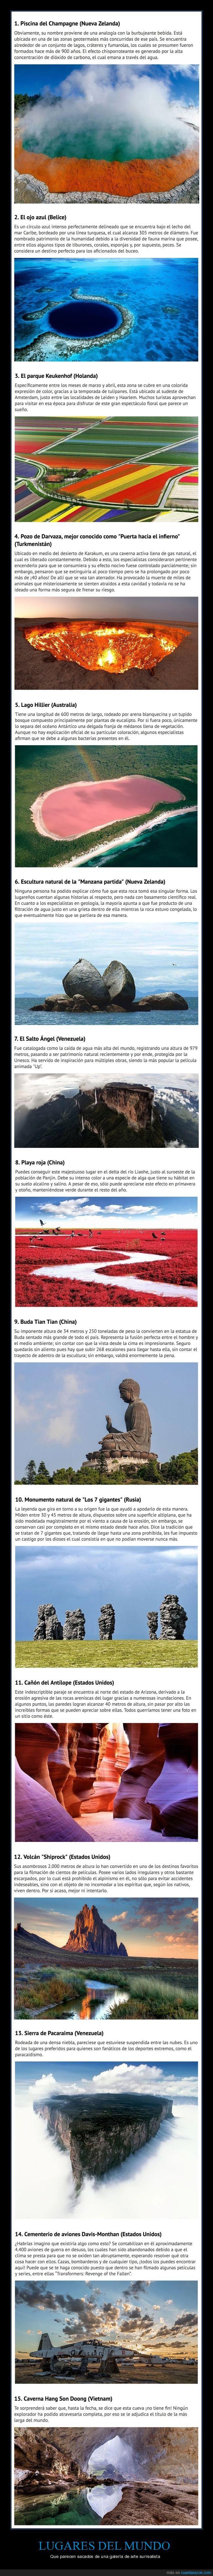 Bonito País Justo Para Colorear Inspiración - Enmarcado Para ...